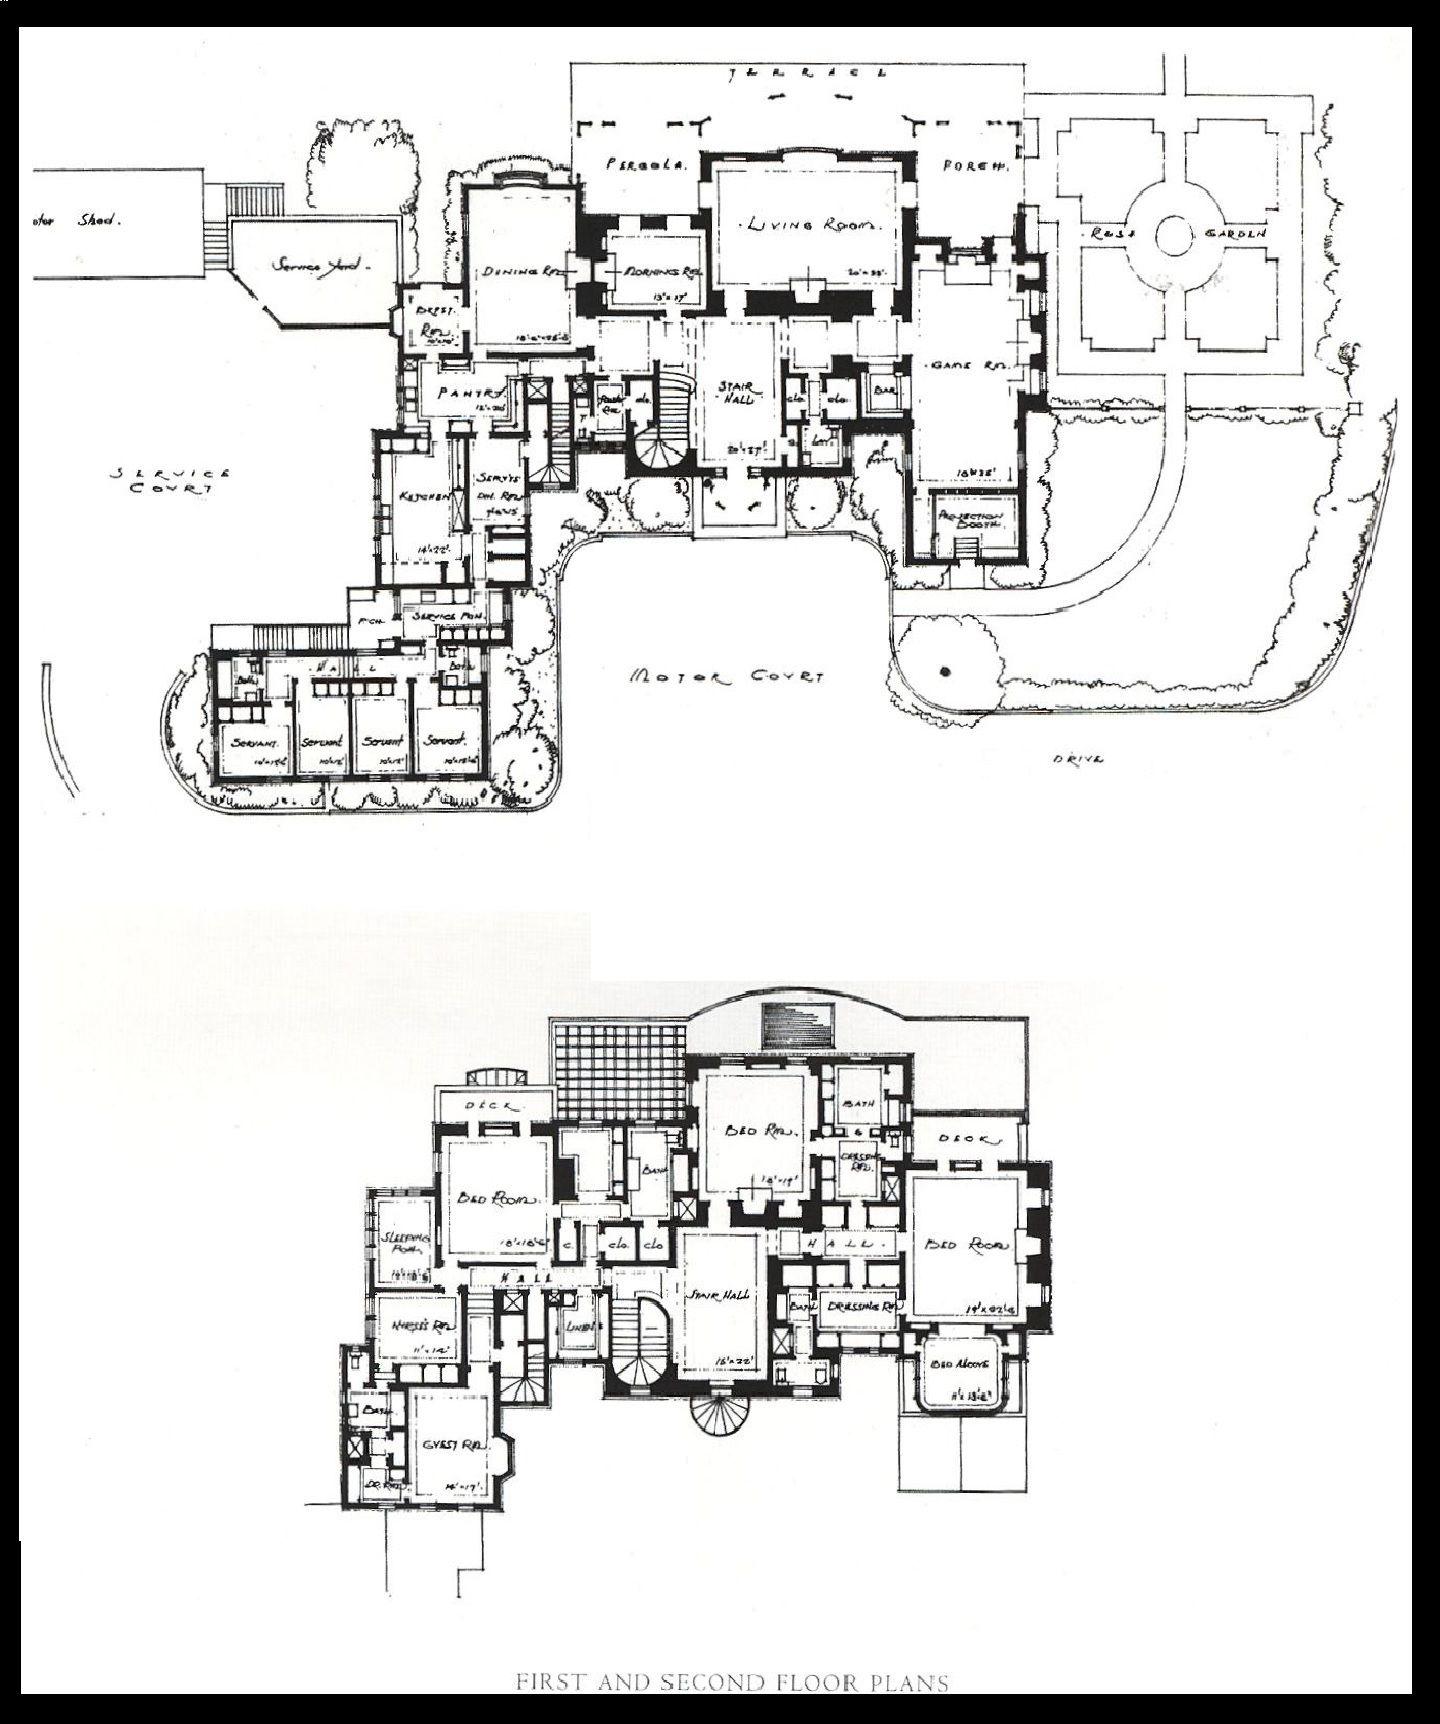 David O Selznick Residence Floor Plan Mansion Floor Plan Building Plans House Dream House Plans